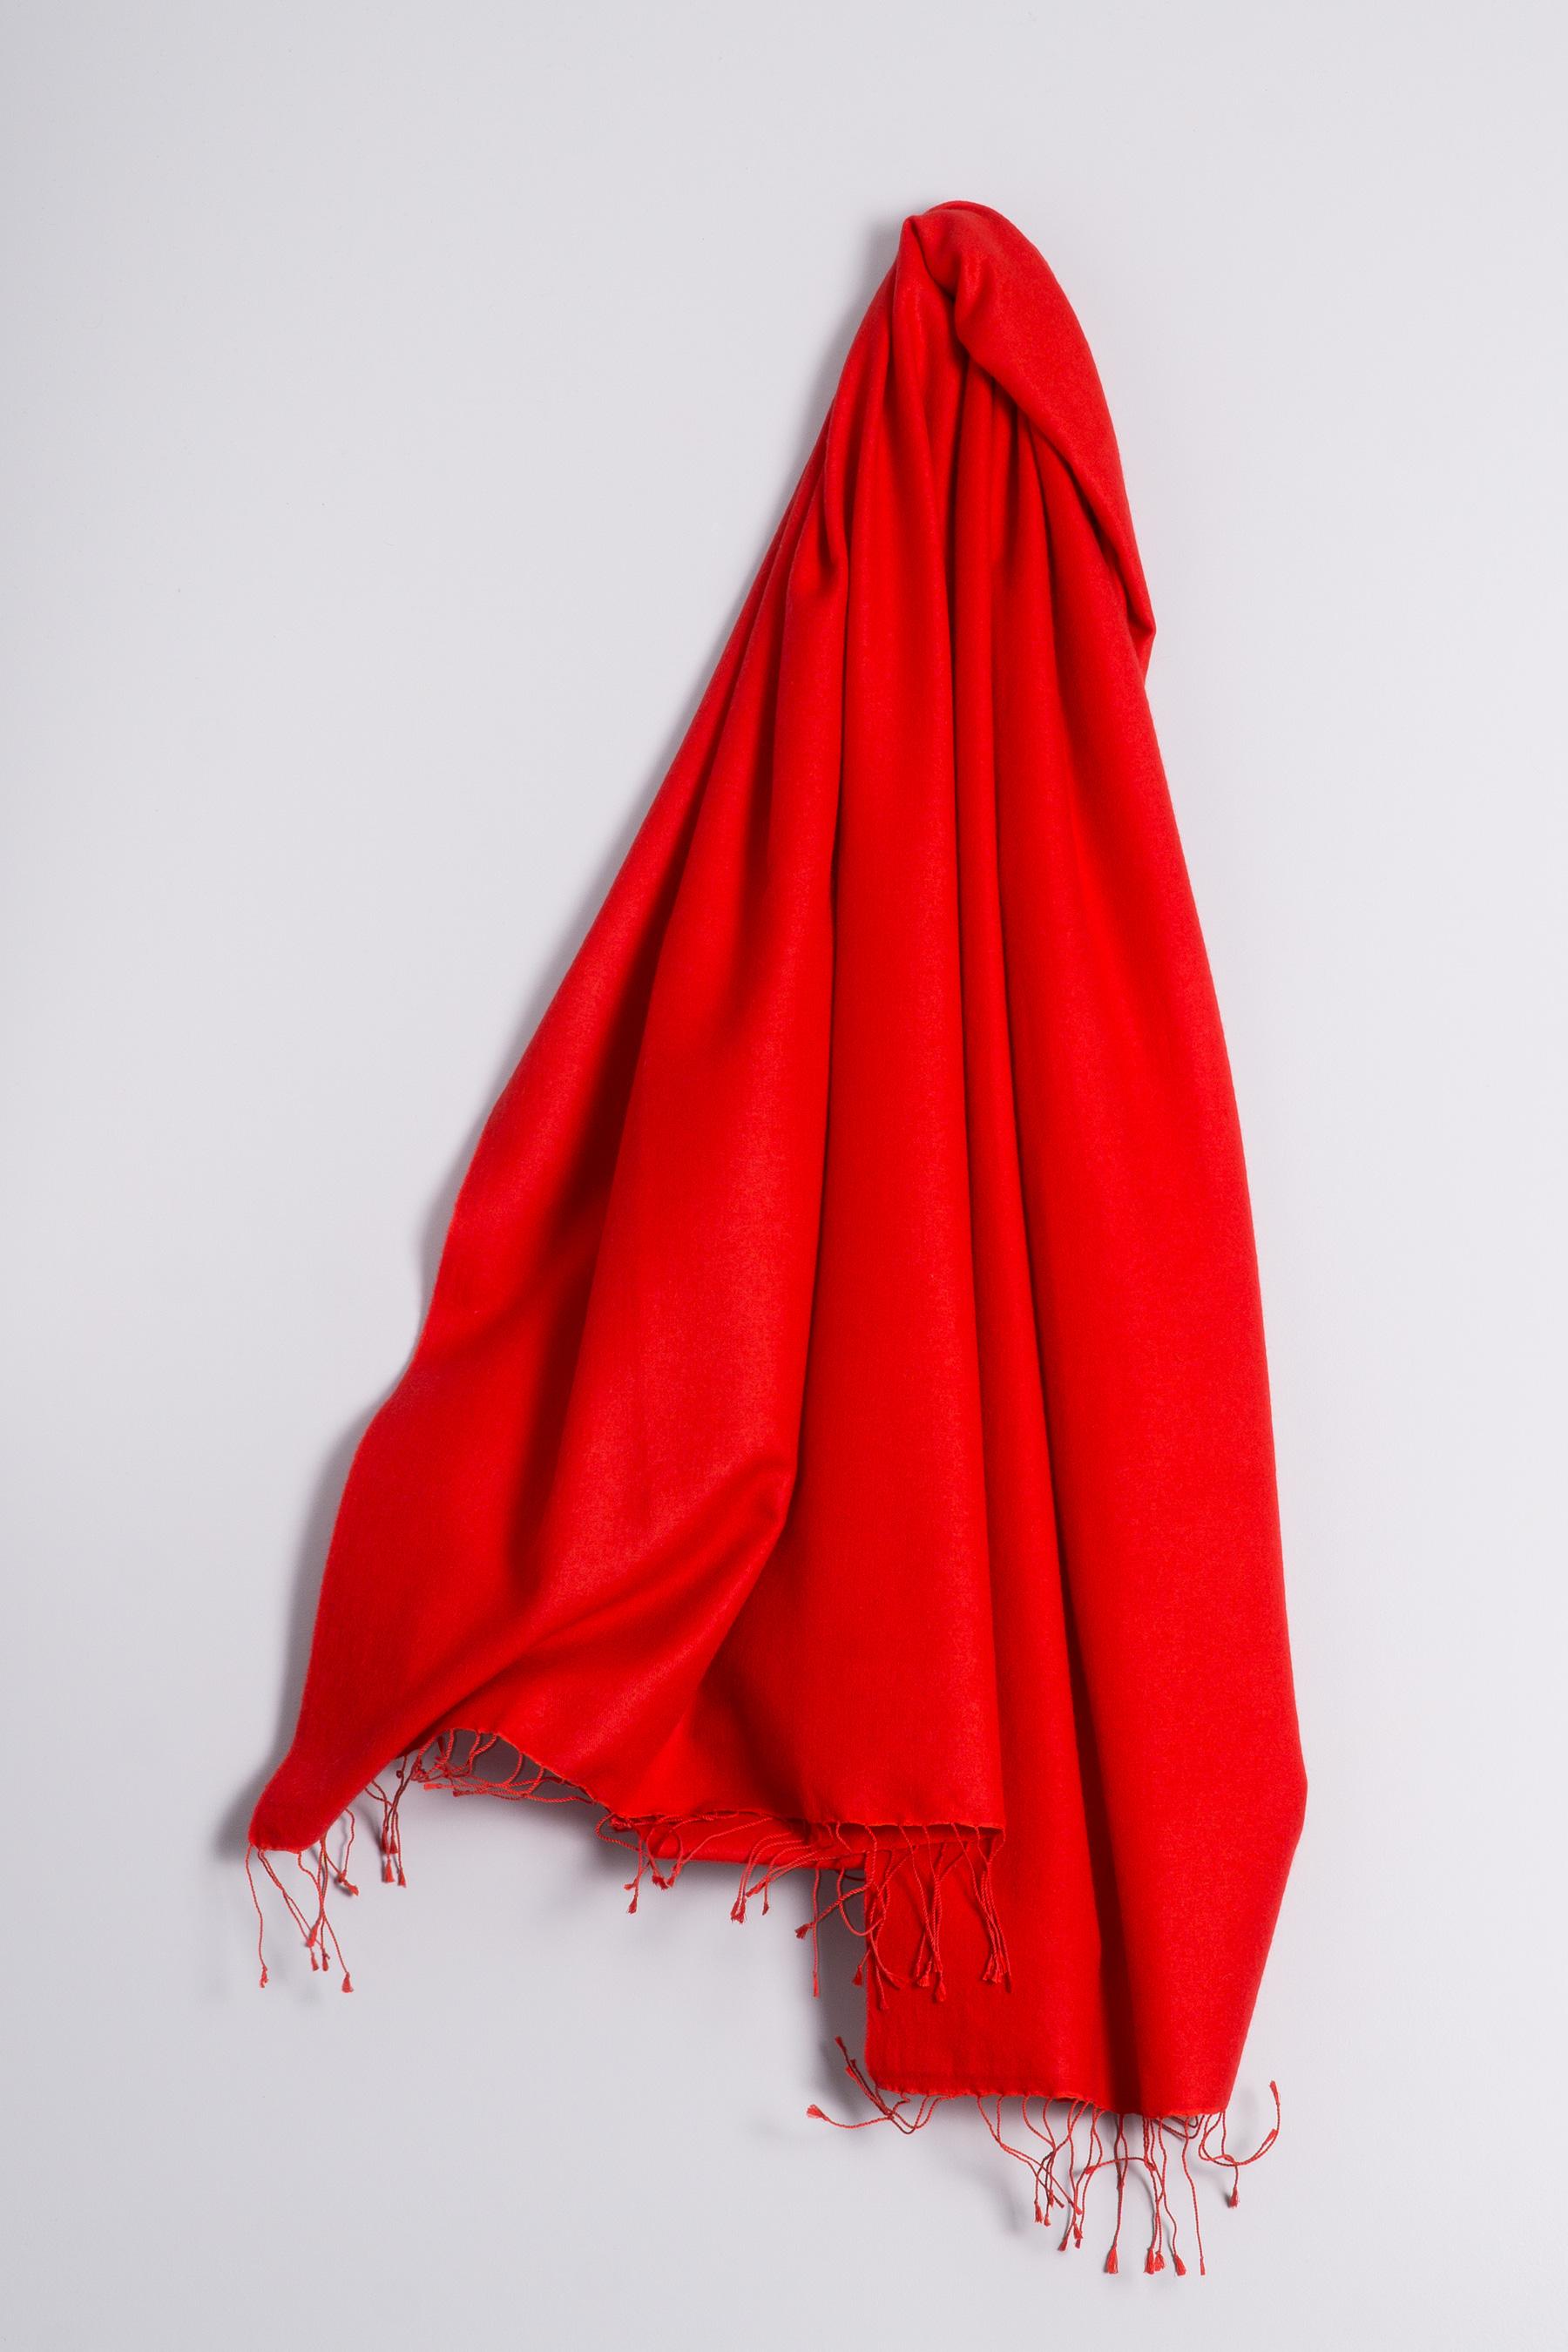 05b6db061d7a20 Pashmina 90x200cm rouge | Pashmina 70% Cachemire Étole | Pashmina | Le- Pashmina-France.com